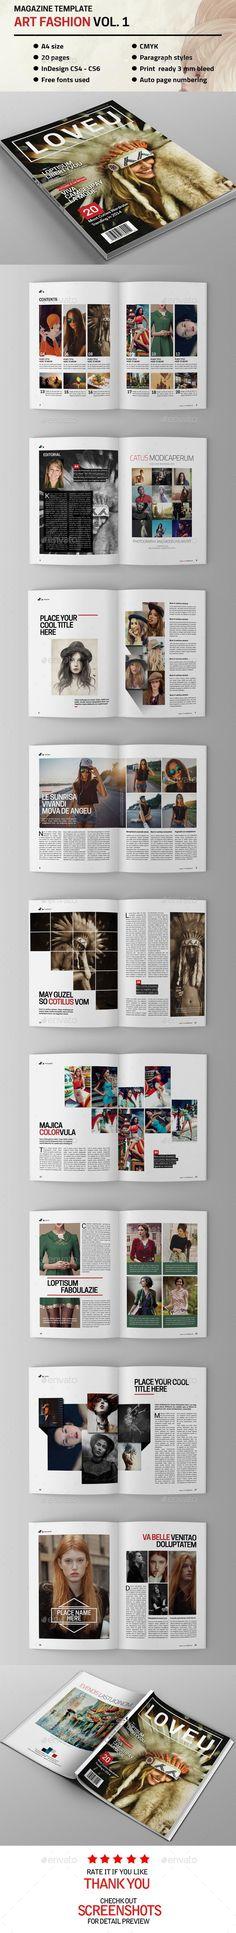 Art Fahion Magazine Template | Download: http://graphicriver.net/item/art-fahion-magazine-vol-1/9822137?ref=ksioks